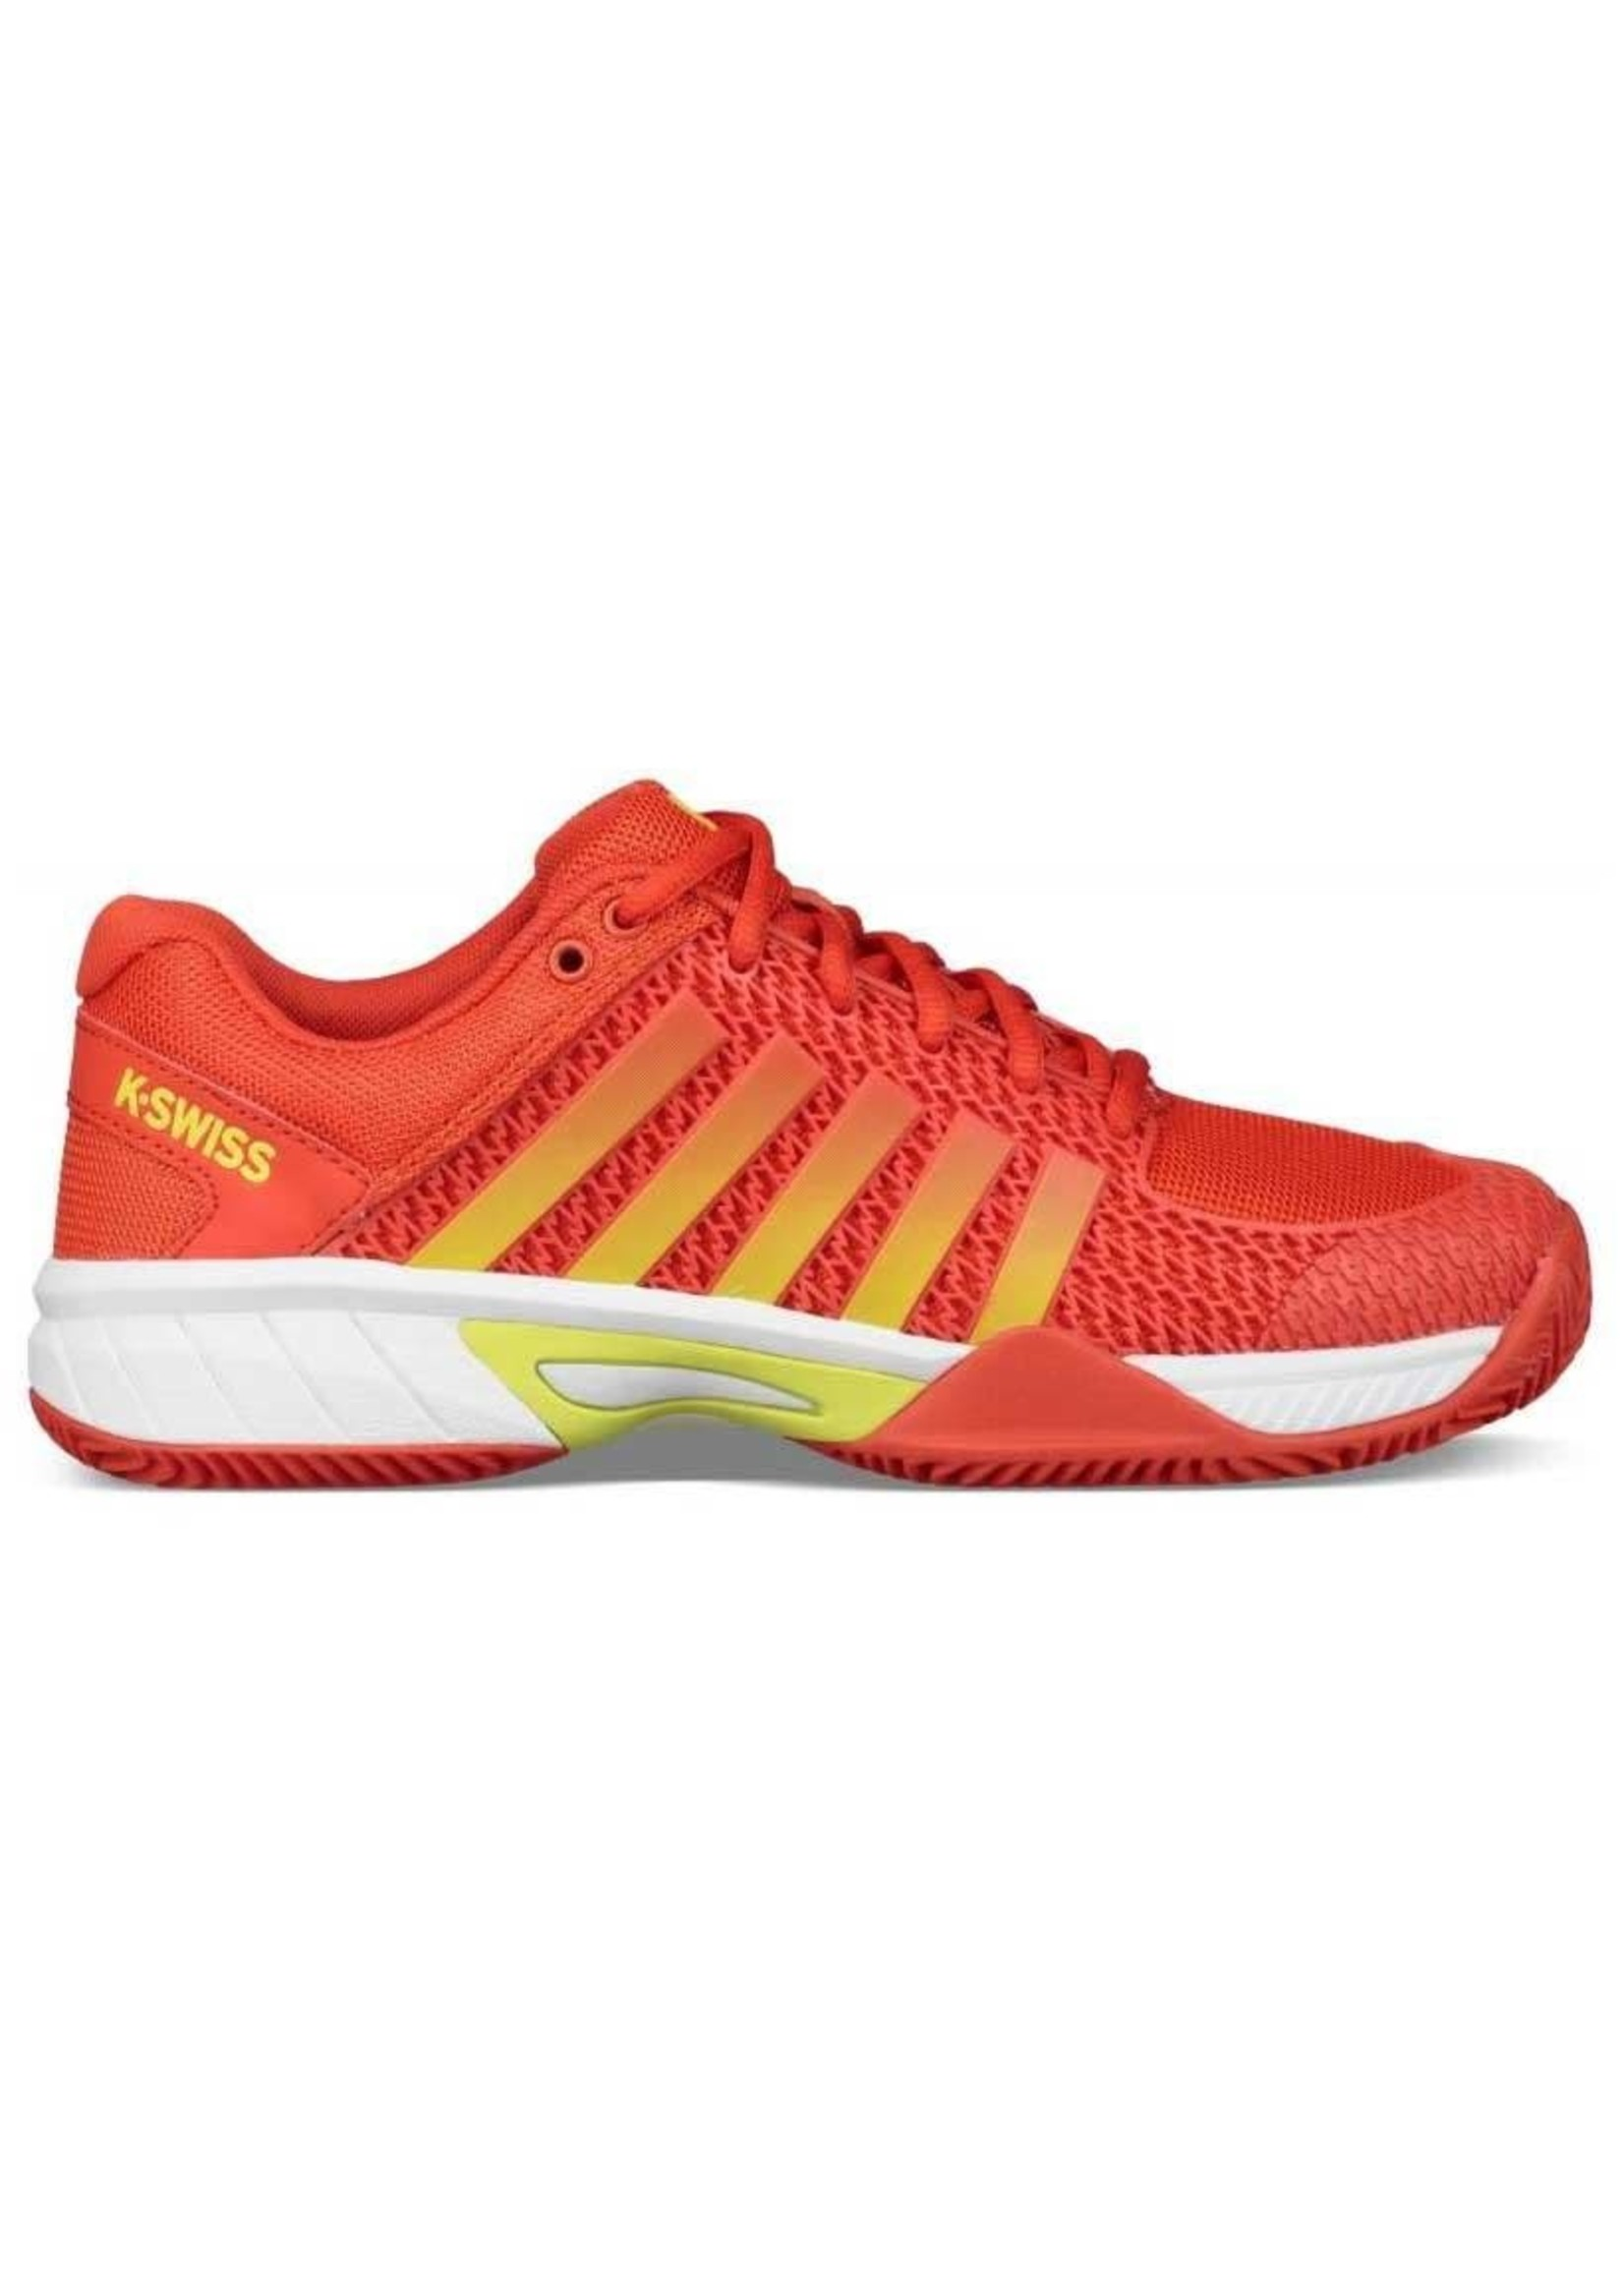 K-Swiss Ladies Express Light Tennis Shoes (2018) Fiesta/Yellow 6.5